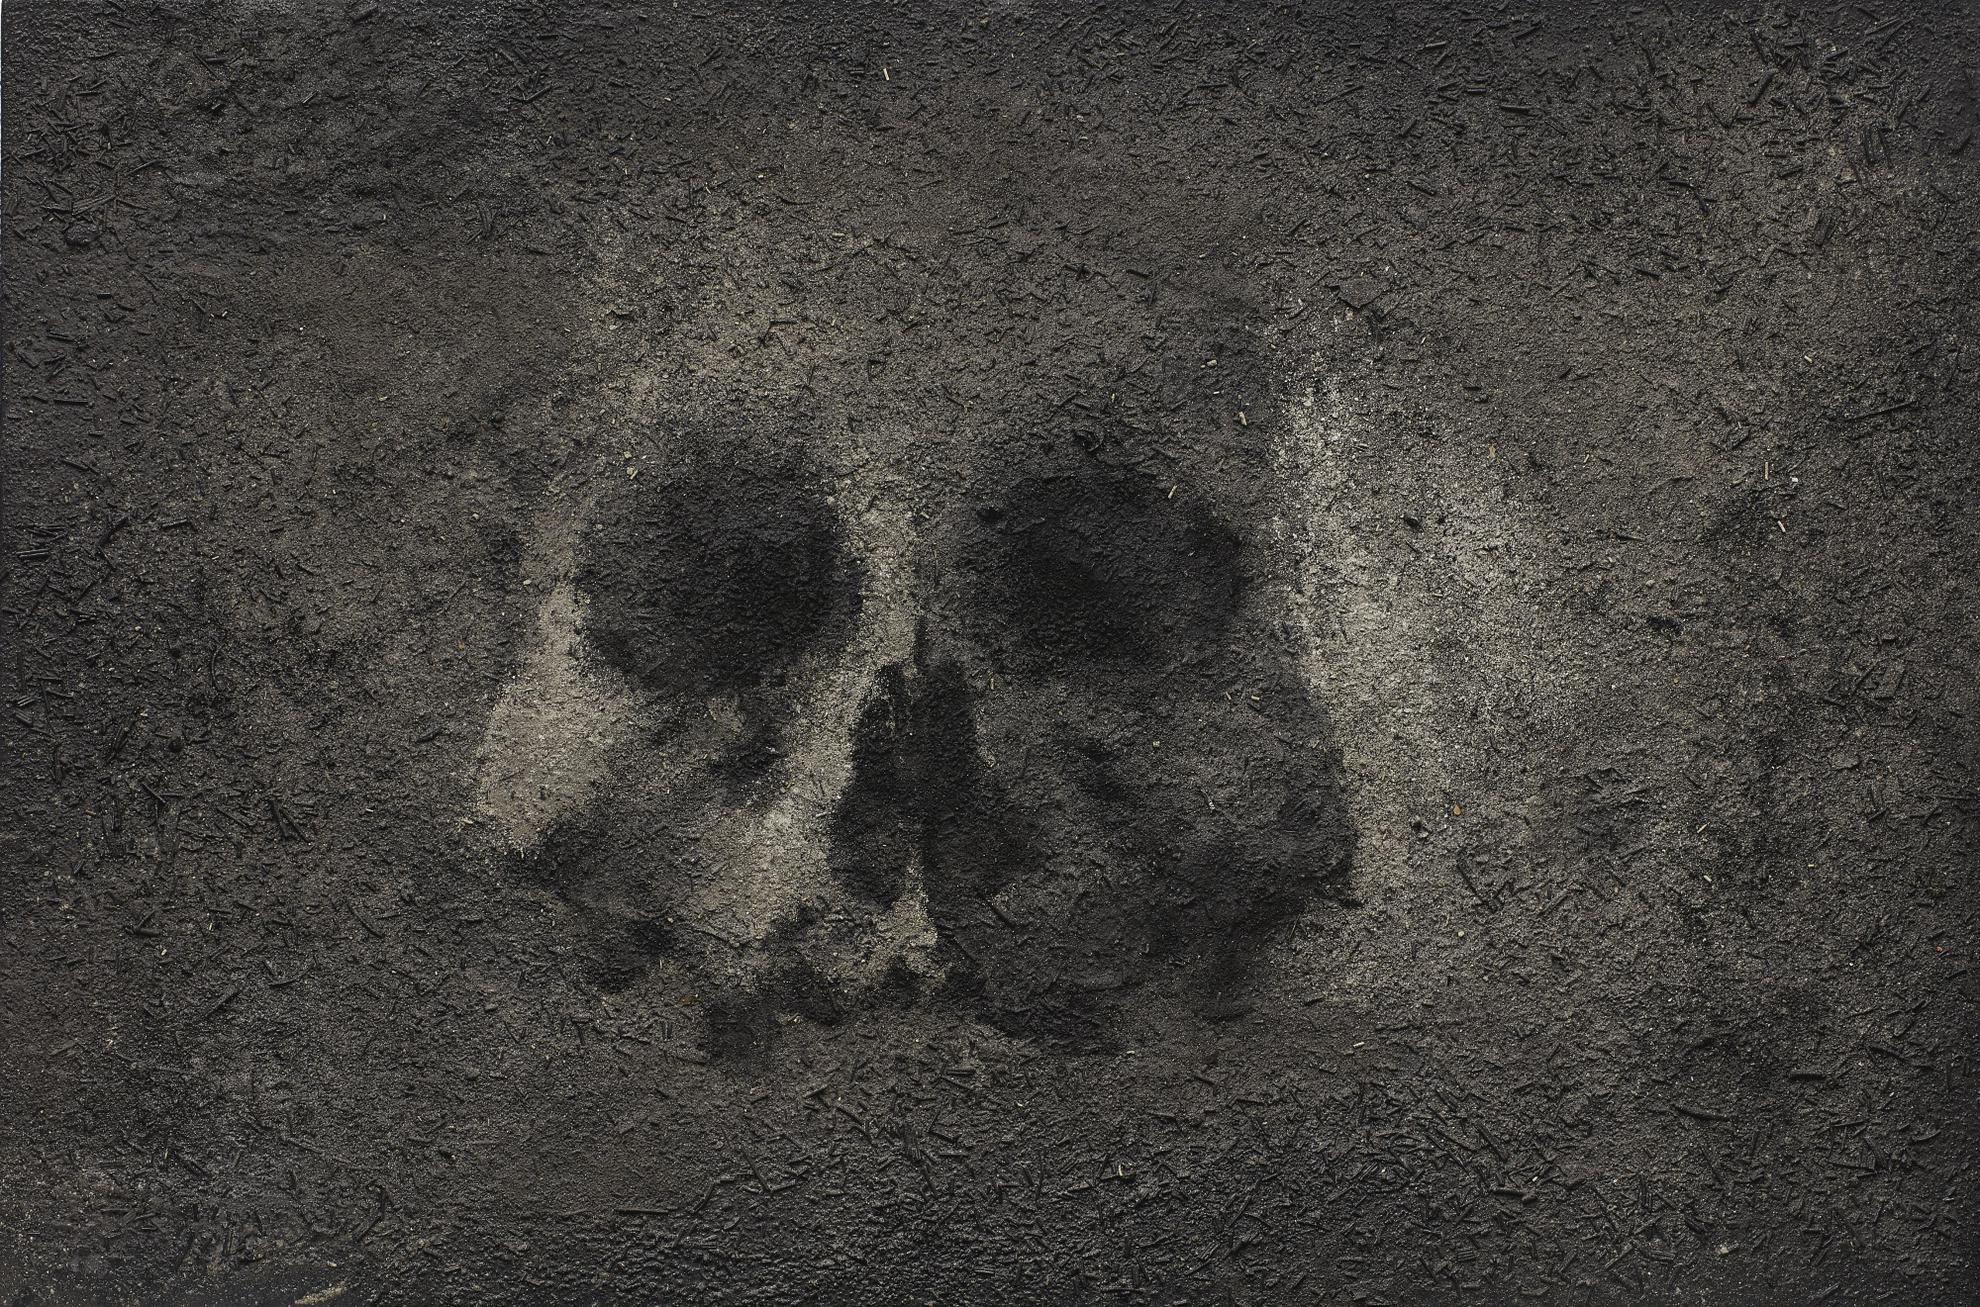 Zhang Huan-Skull-2007